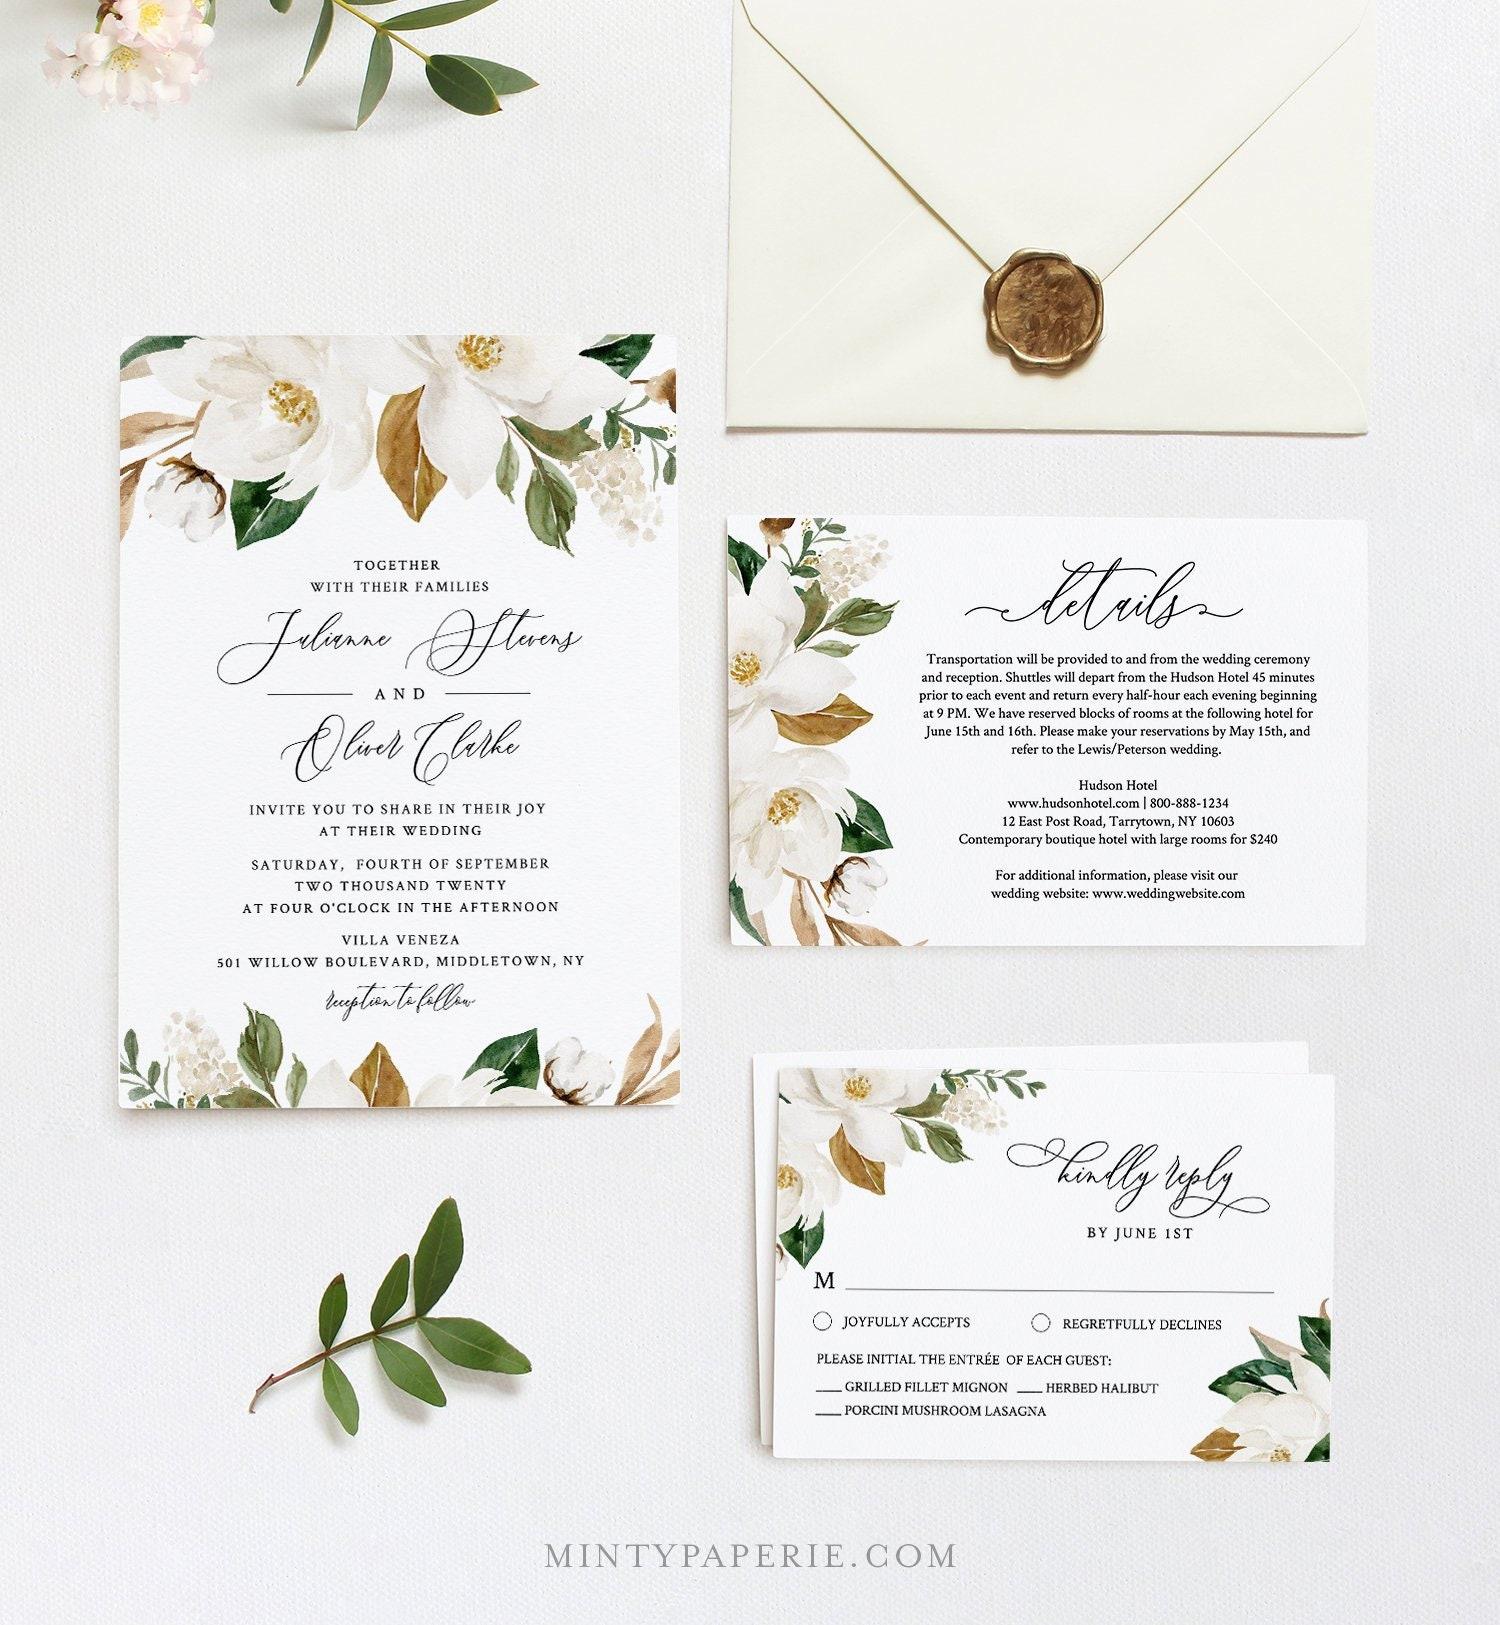 Magnolia Wedding Invitation Template DiY Southern Cotton